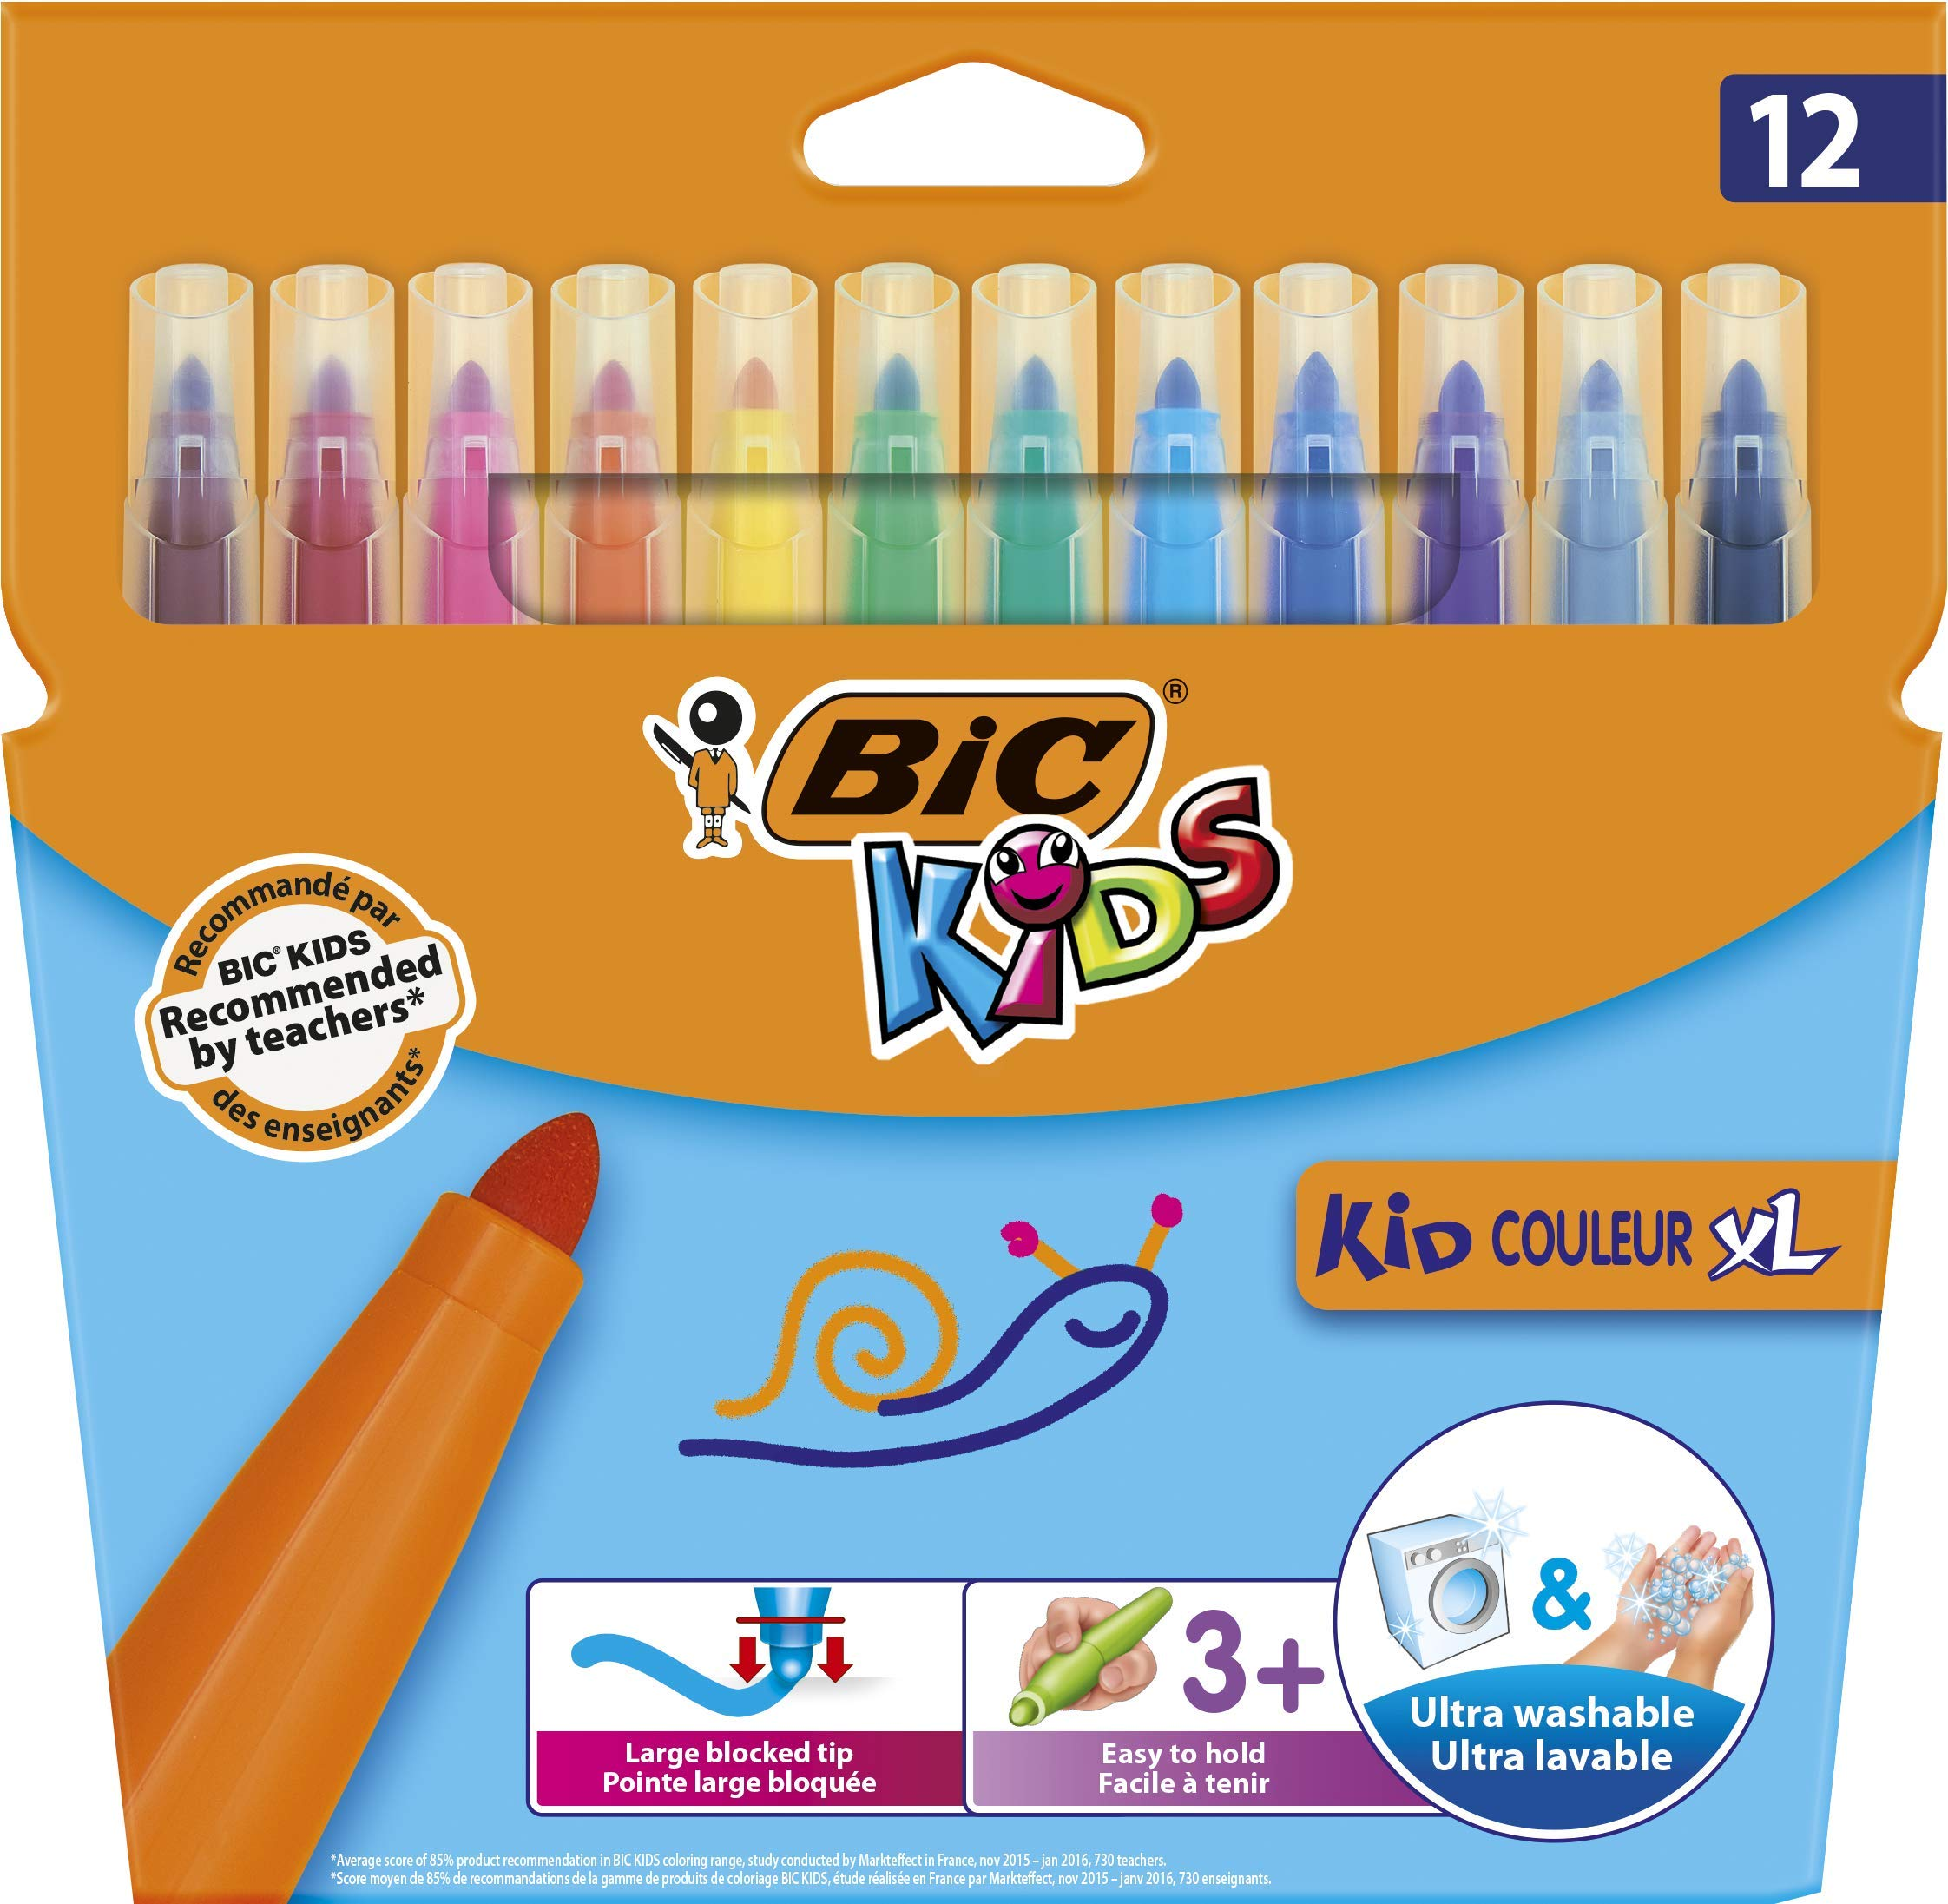 BIC Kids Kid Couleur XL rotuladores Punta Ancha – colores Surtidos, Caja de 12 unidades